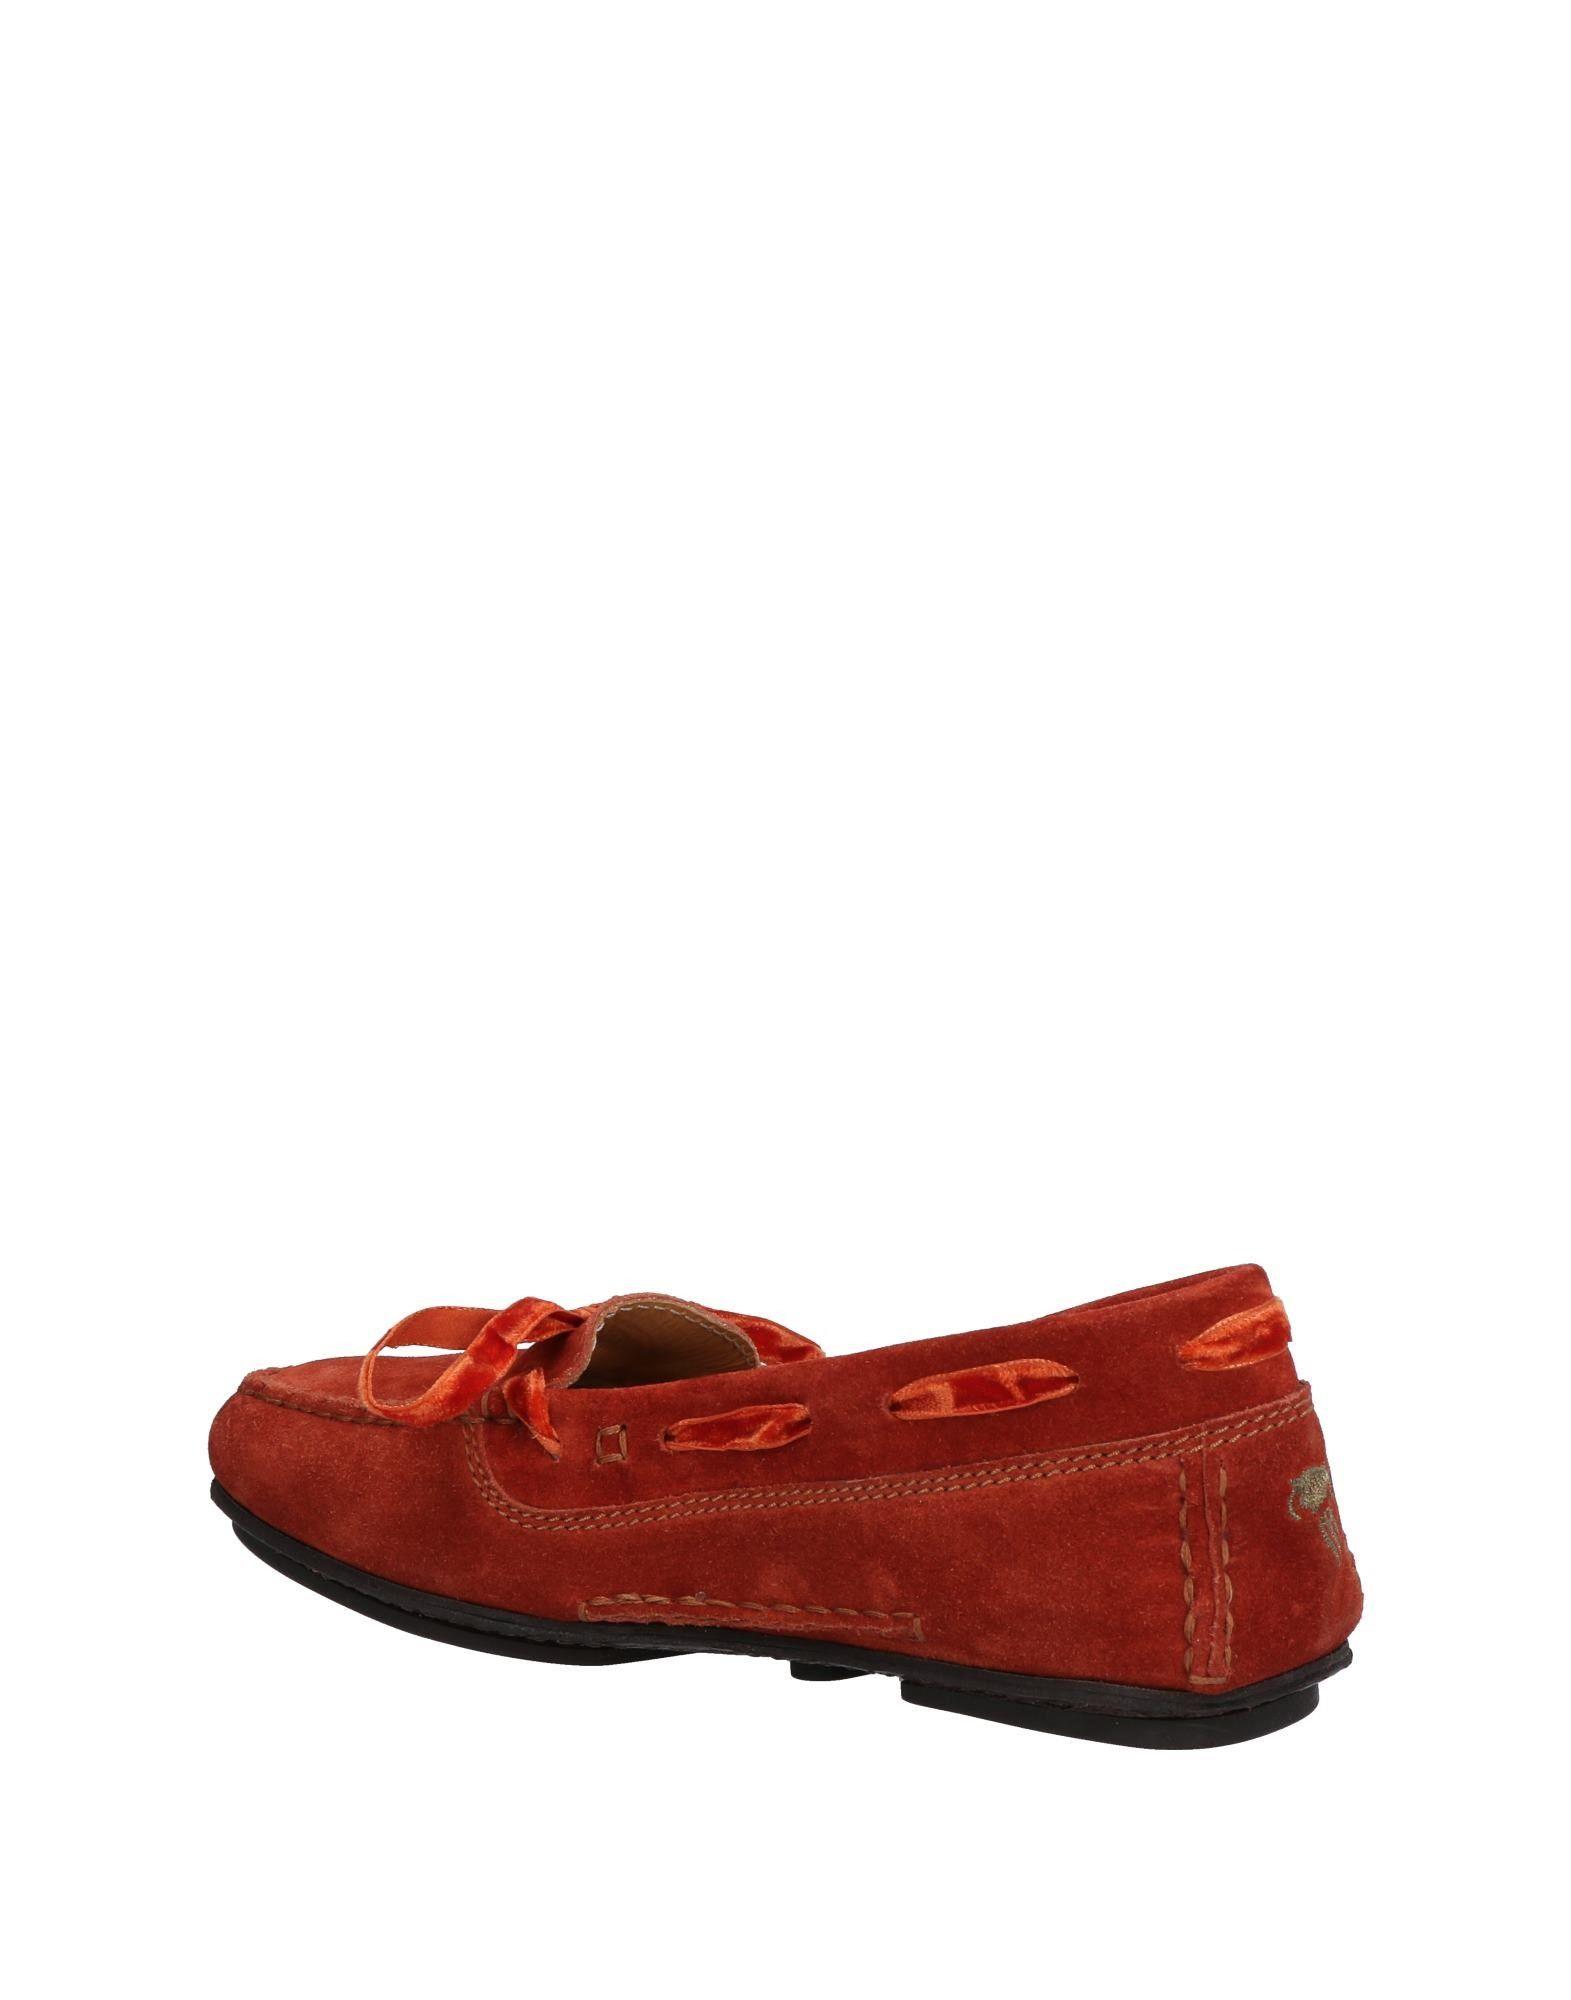 Stilvolle billige  Schuhe Arfango Mokassins Damen  billige 11476371OO 25ba5a